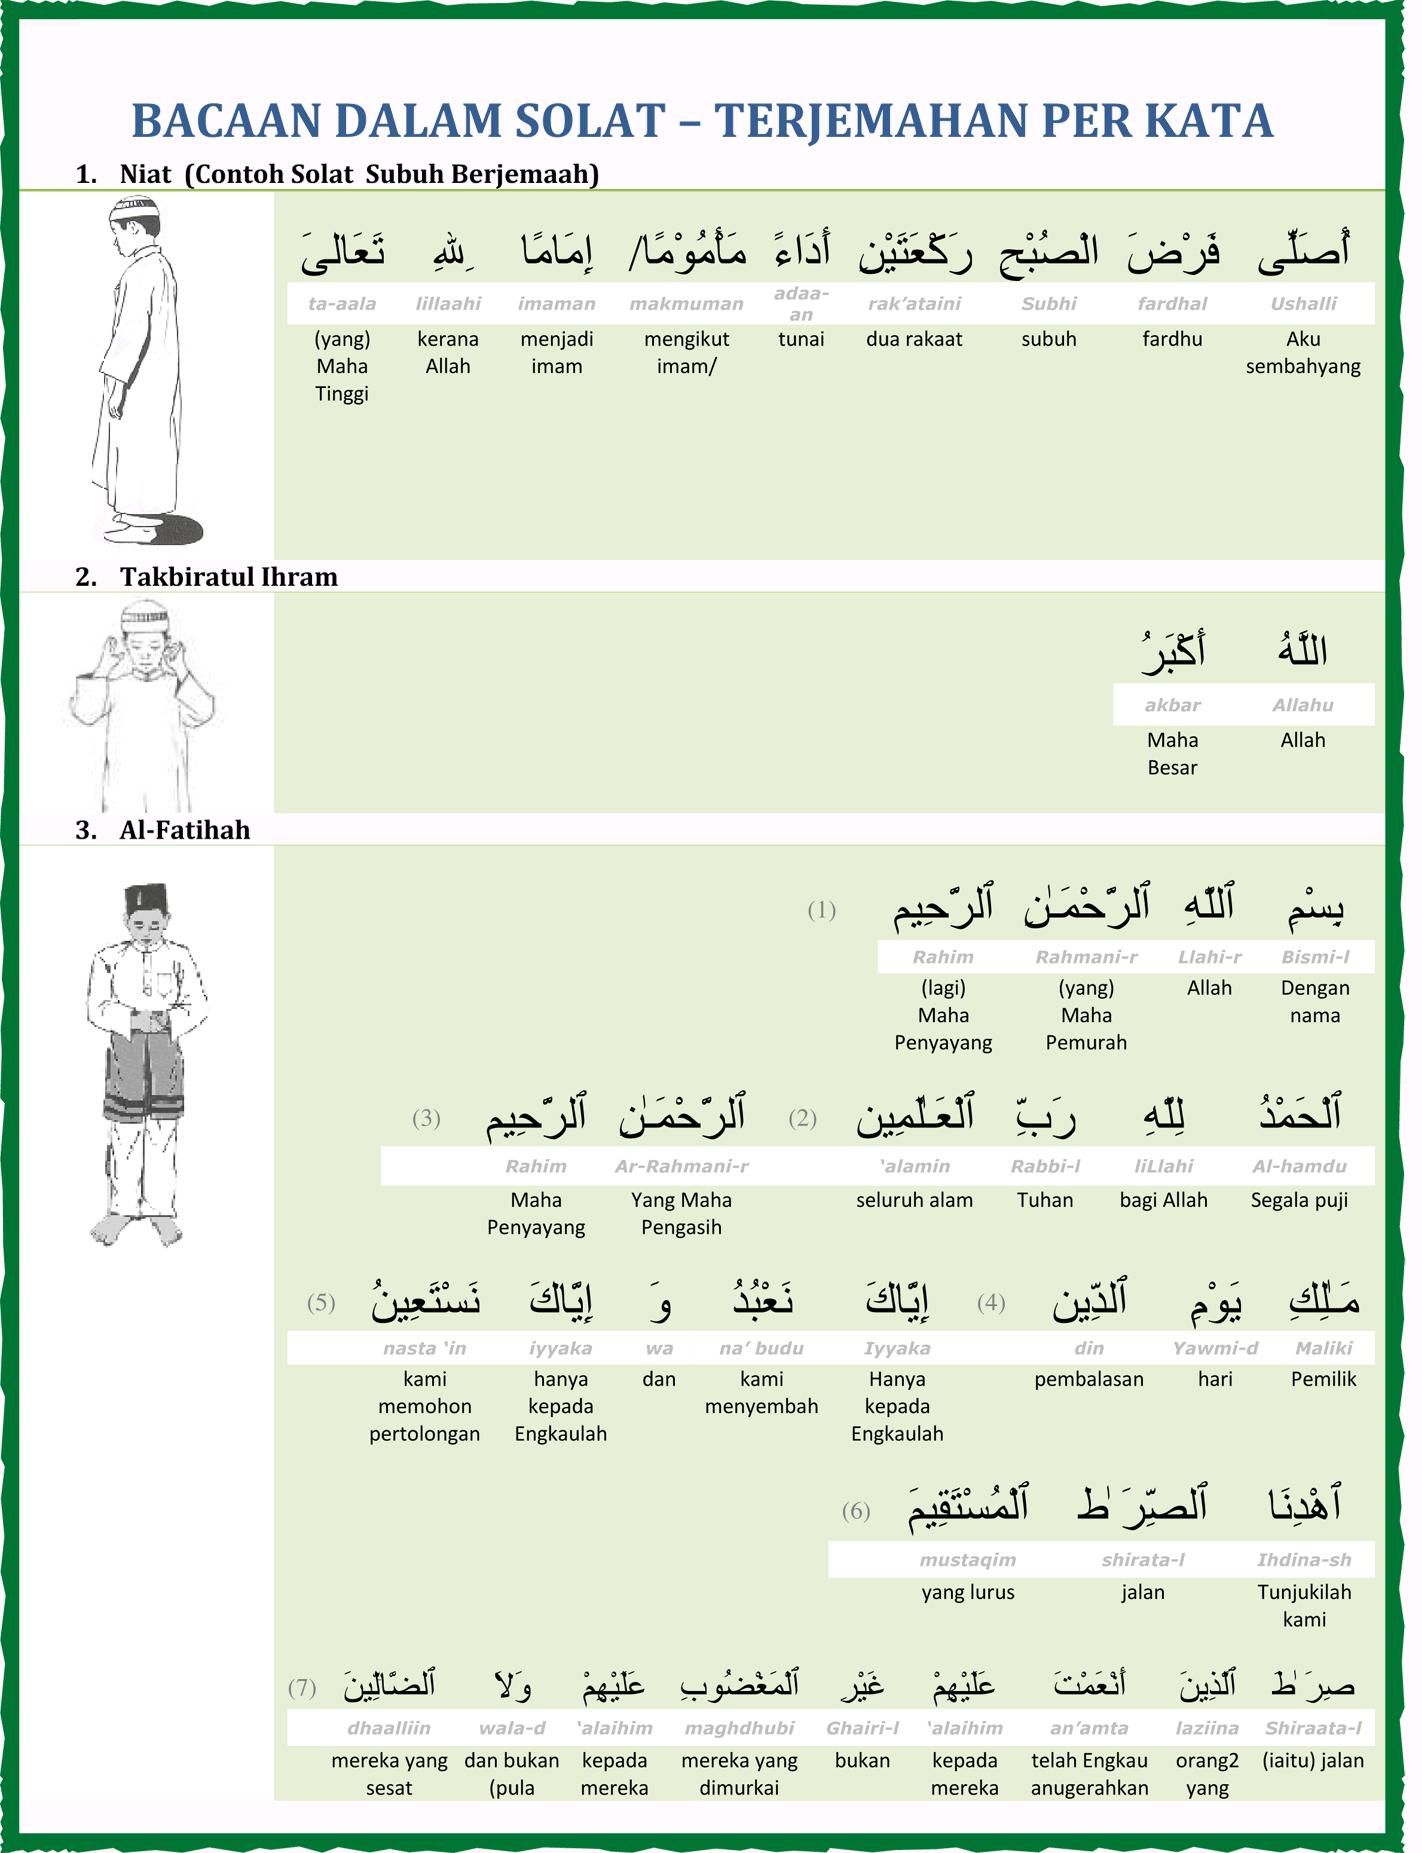 Terjemahan Per Kata Bacaan Bacaan Dalam Solat Ahlimasjid